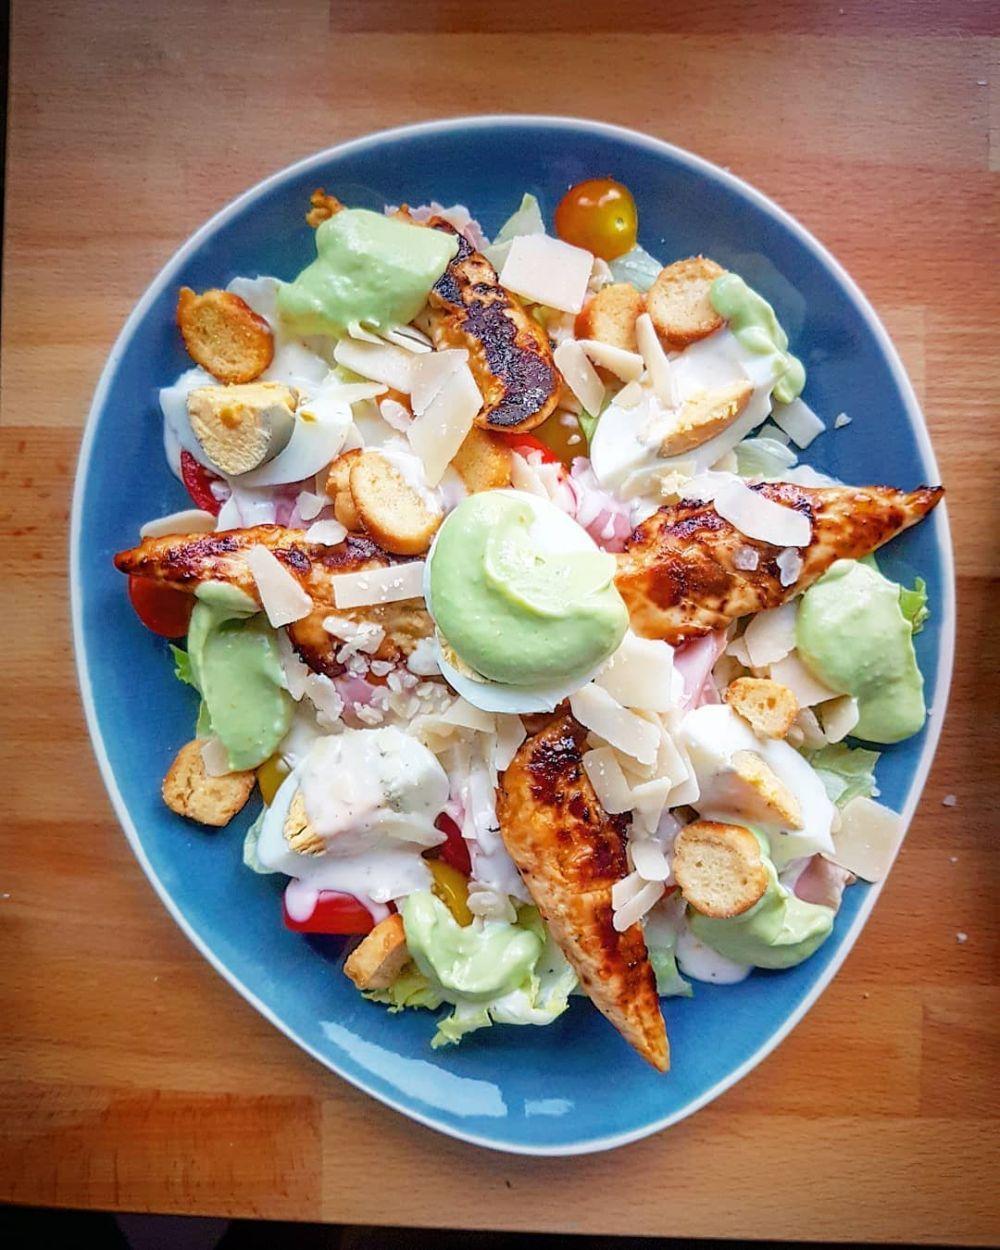 Resep Salad C 2019 Brilio Net Resep Salad Makan Siang Salad Sayur